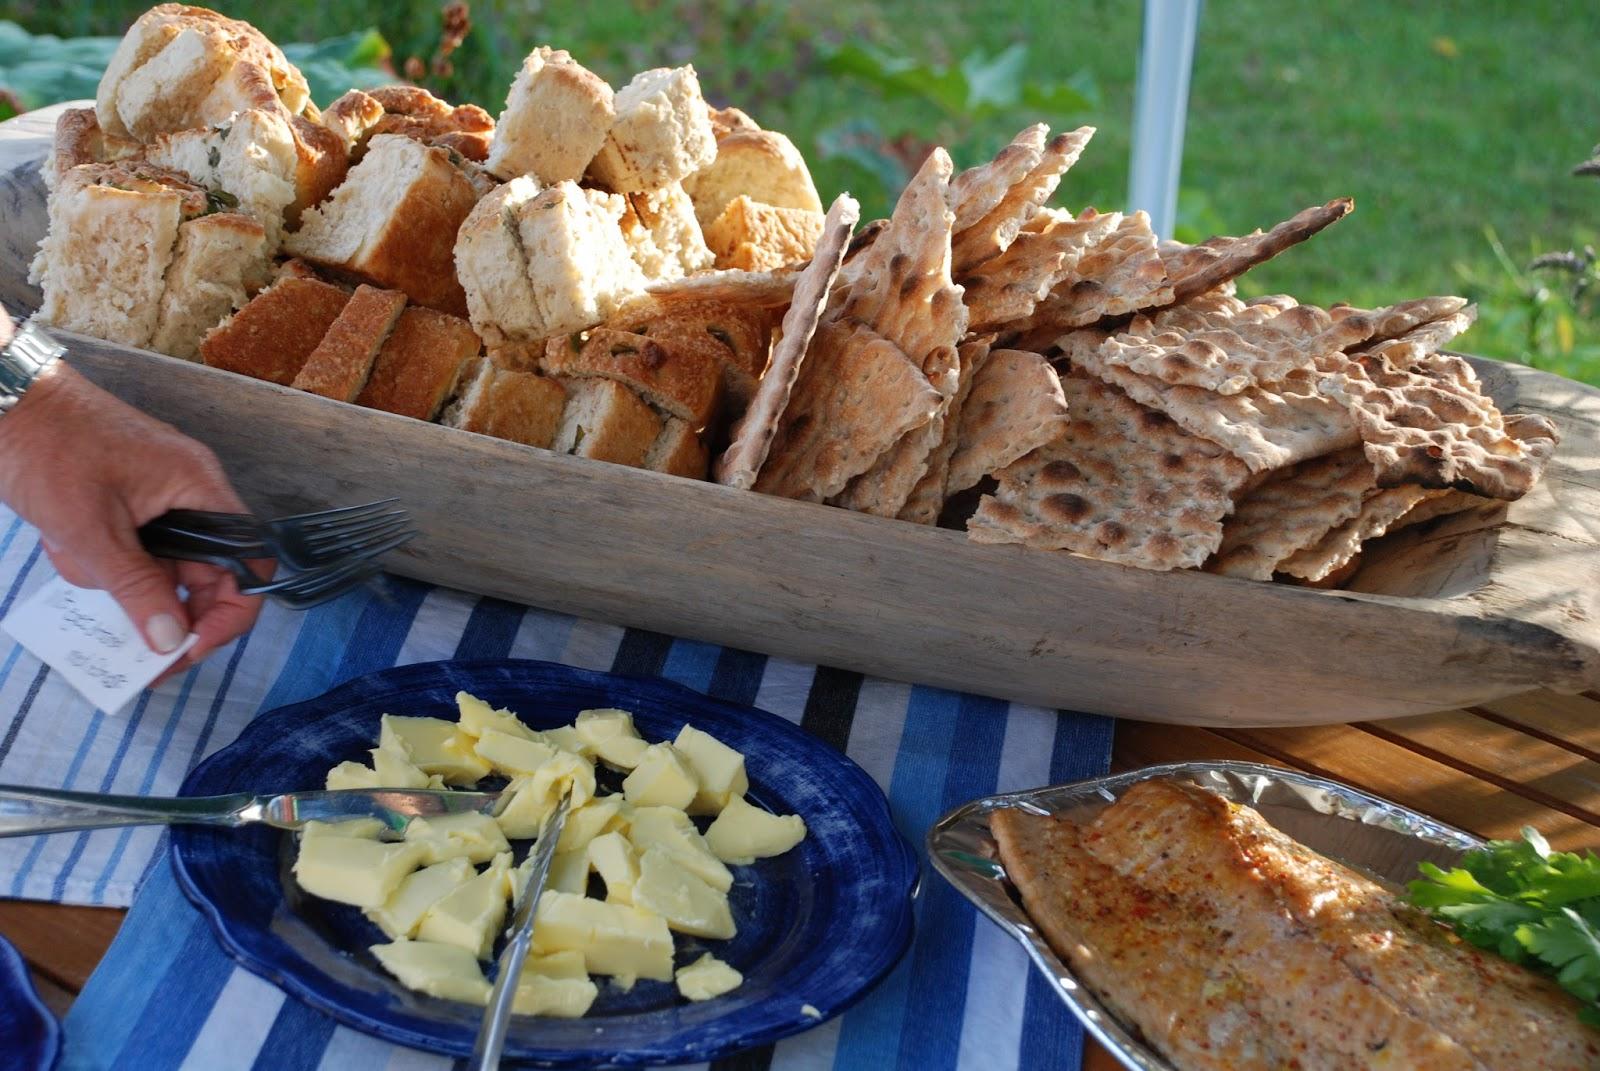 40 års fest mat Smaskelismaskens: Bilder från Kikkis 40 årsfest 40 års fest mat